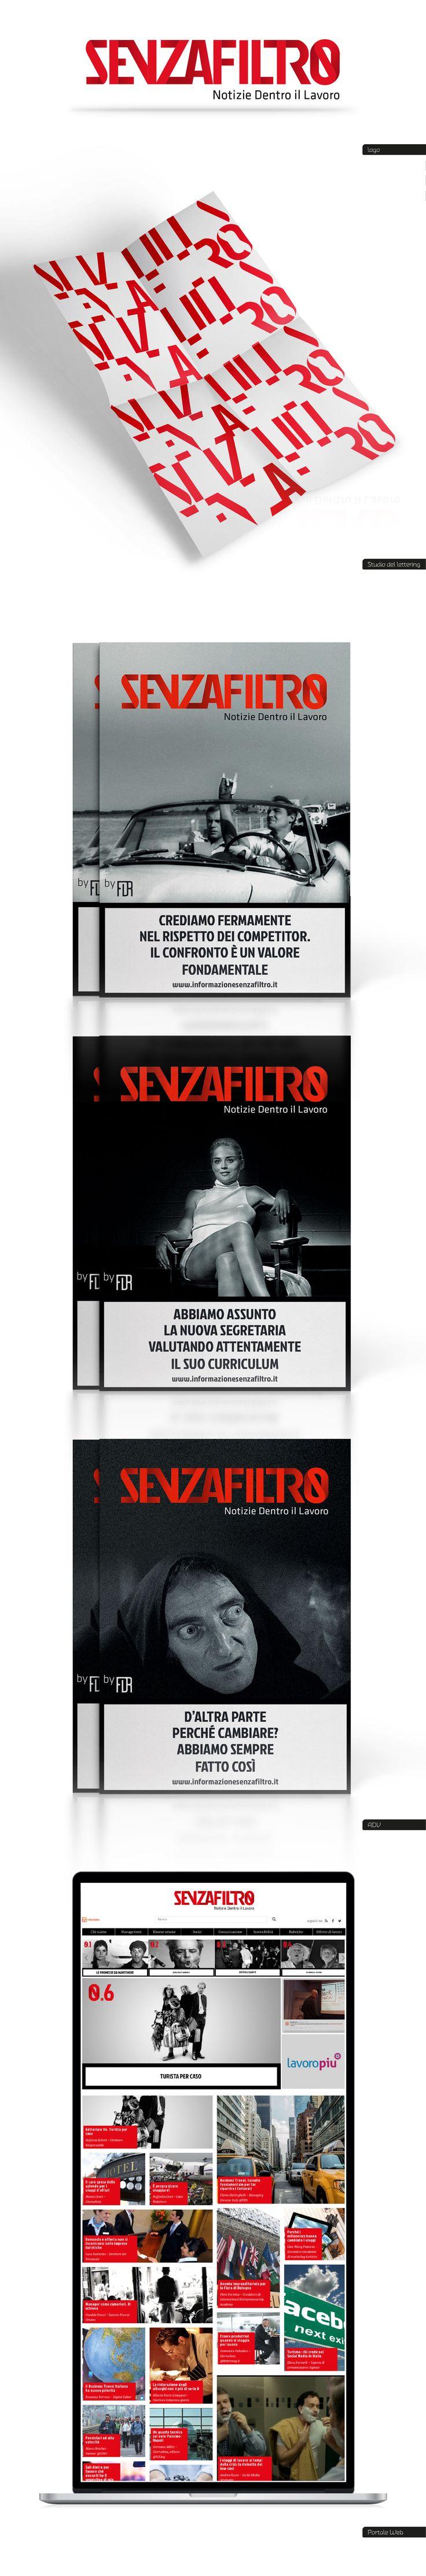 Brand identity SENZAFILTRO  by Questagenzianonhanome